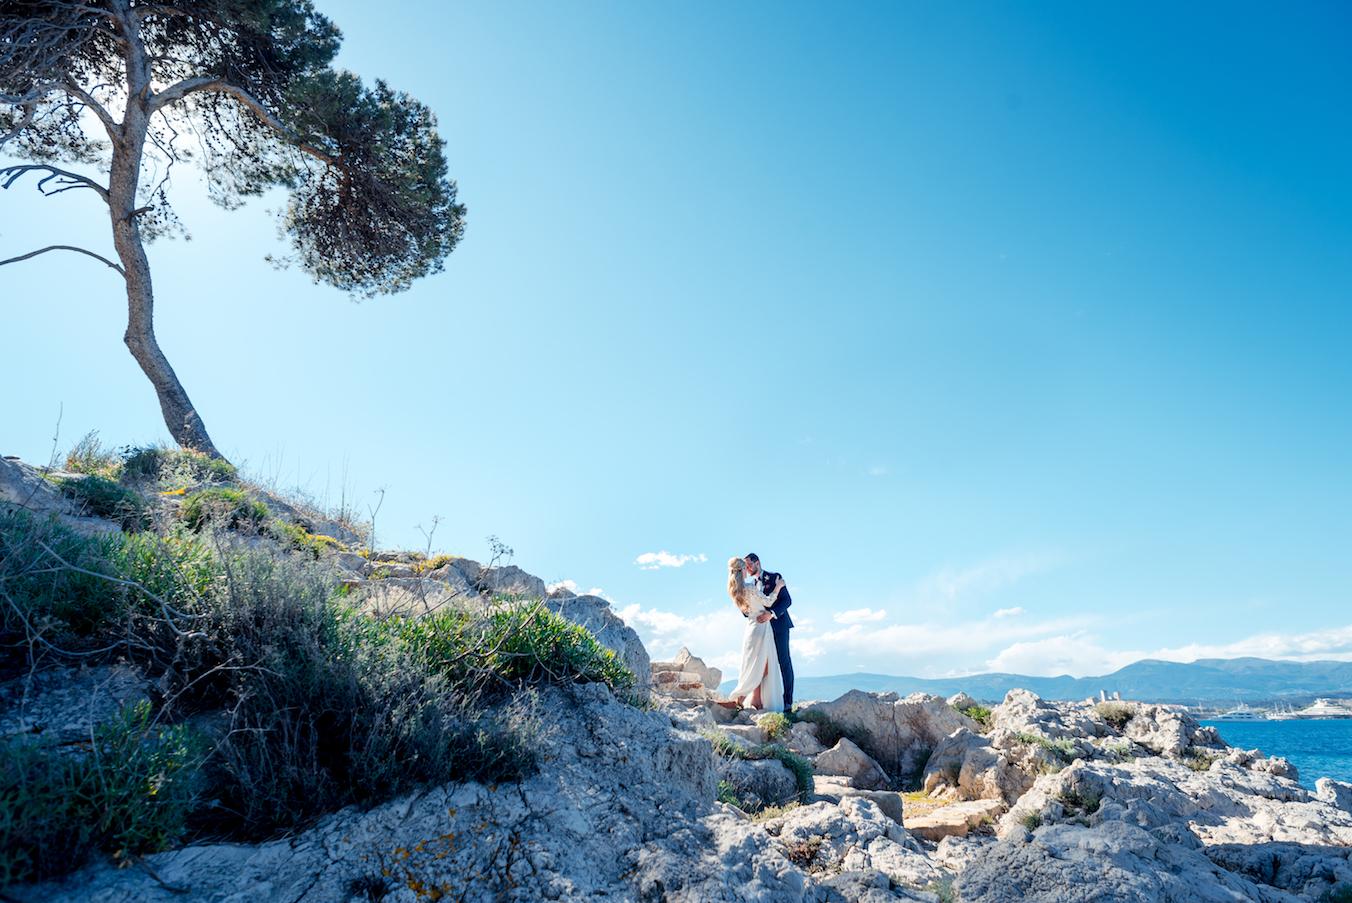 Antibes Wedding Belles Rives FrenAntibes Wedding Belles Rives French Riviera - Photographe Mariage Belles Rives ch Riviera